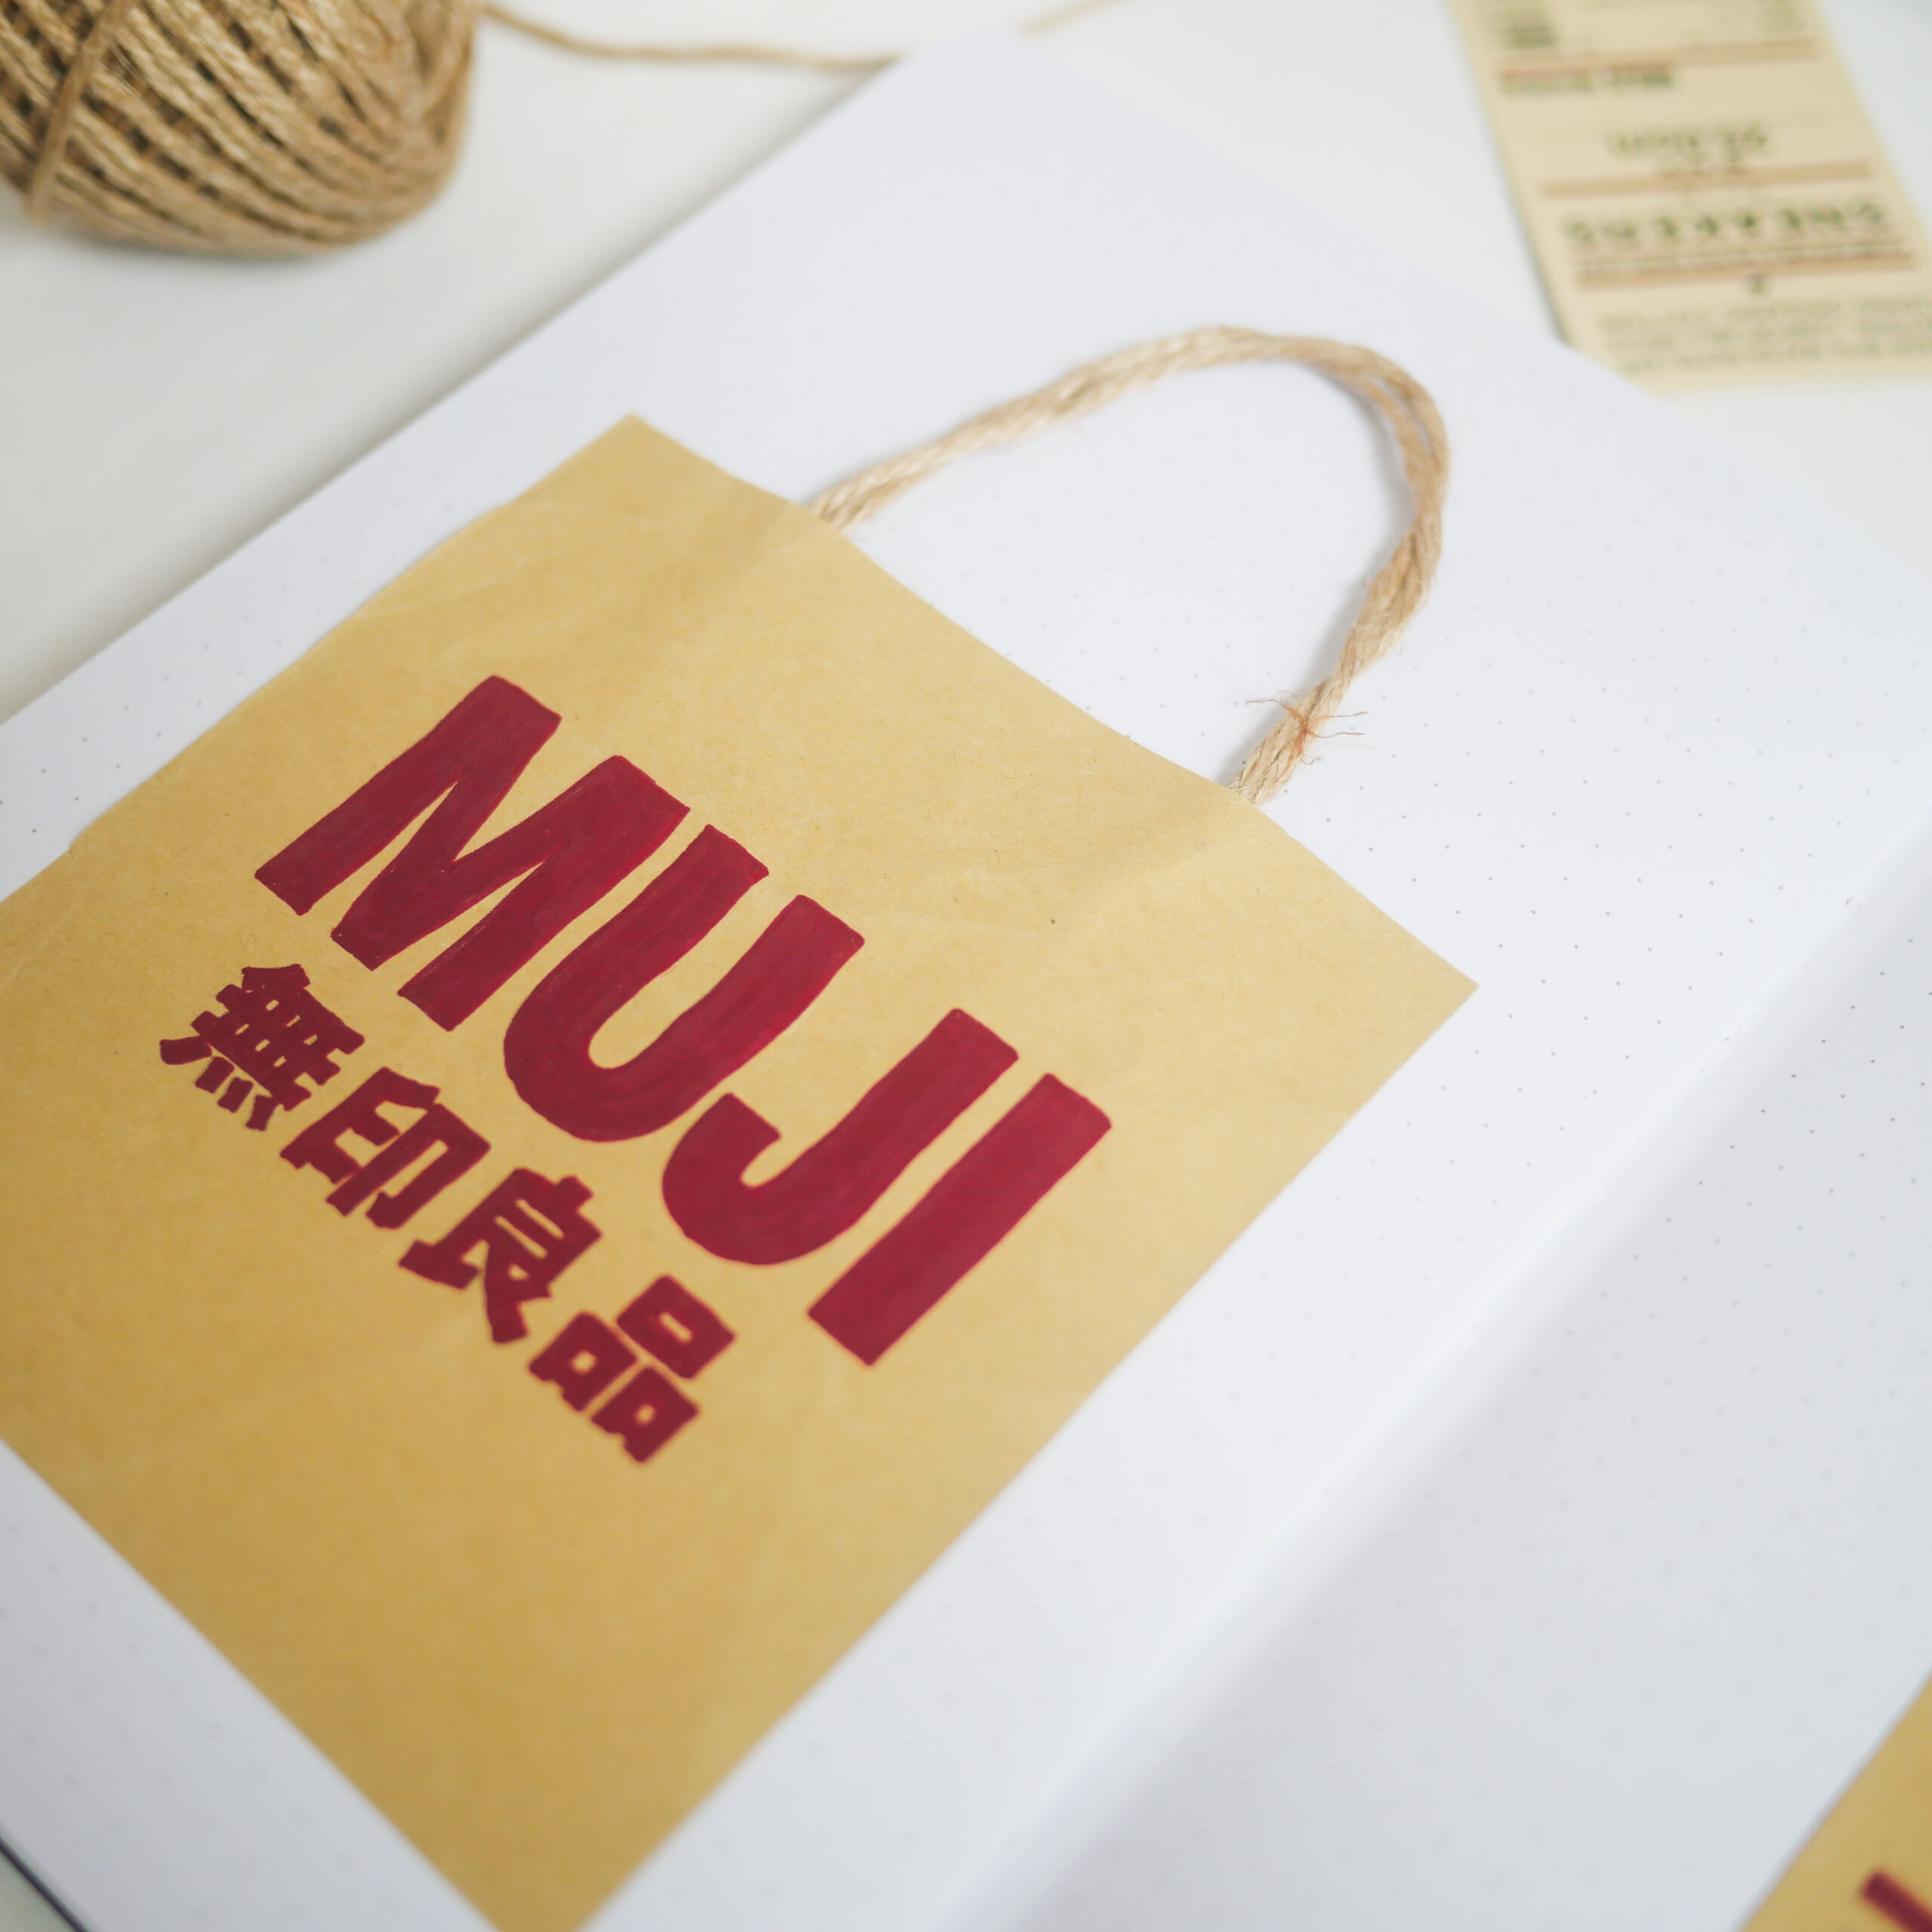 Minimal Bullet Journal Setup - Cover Page Muji Paper Bag